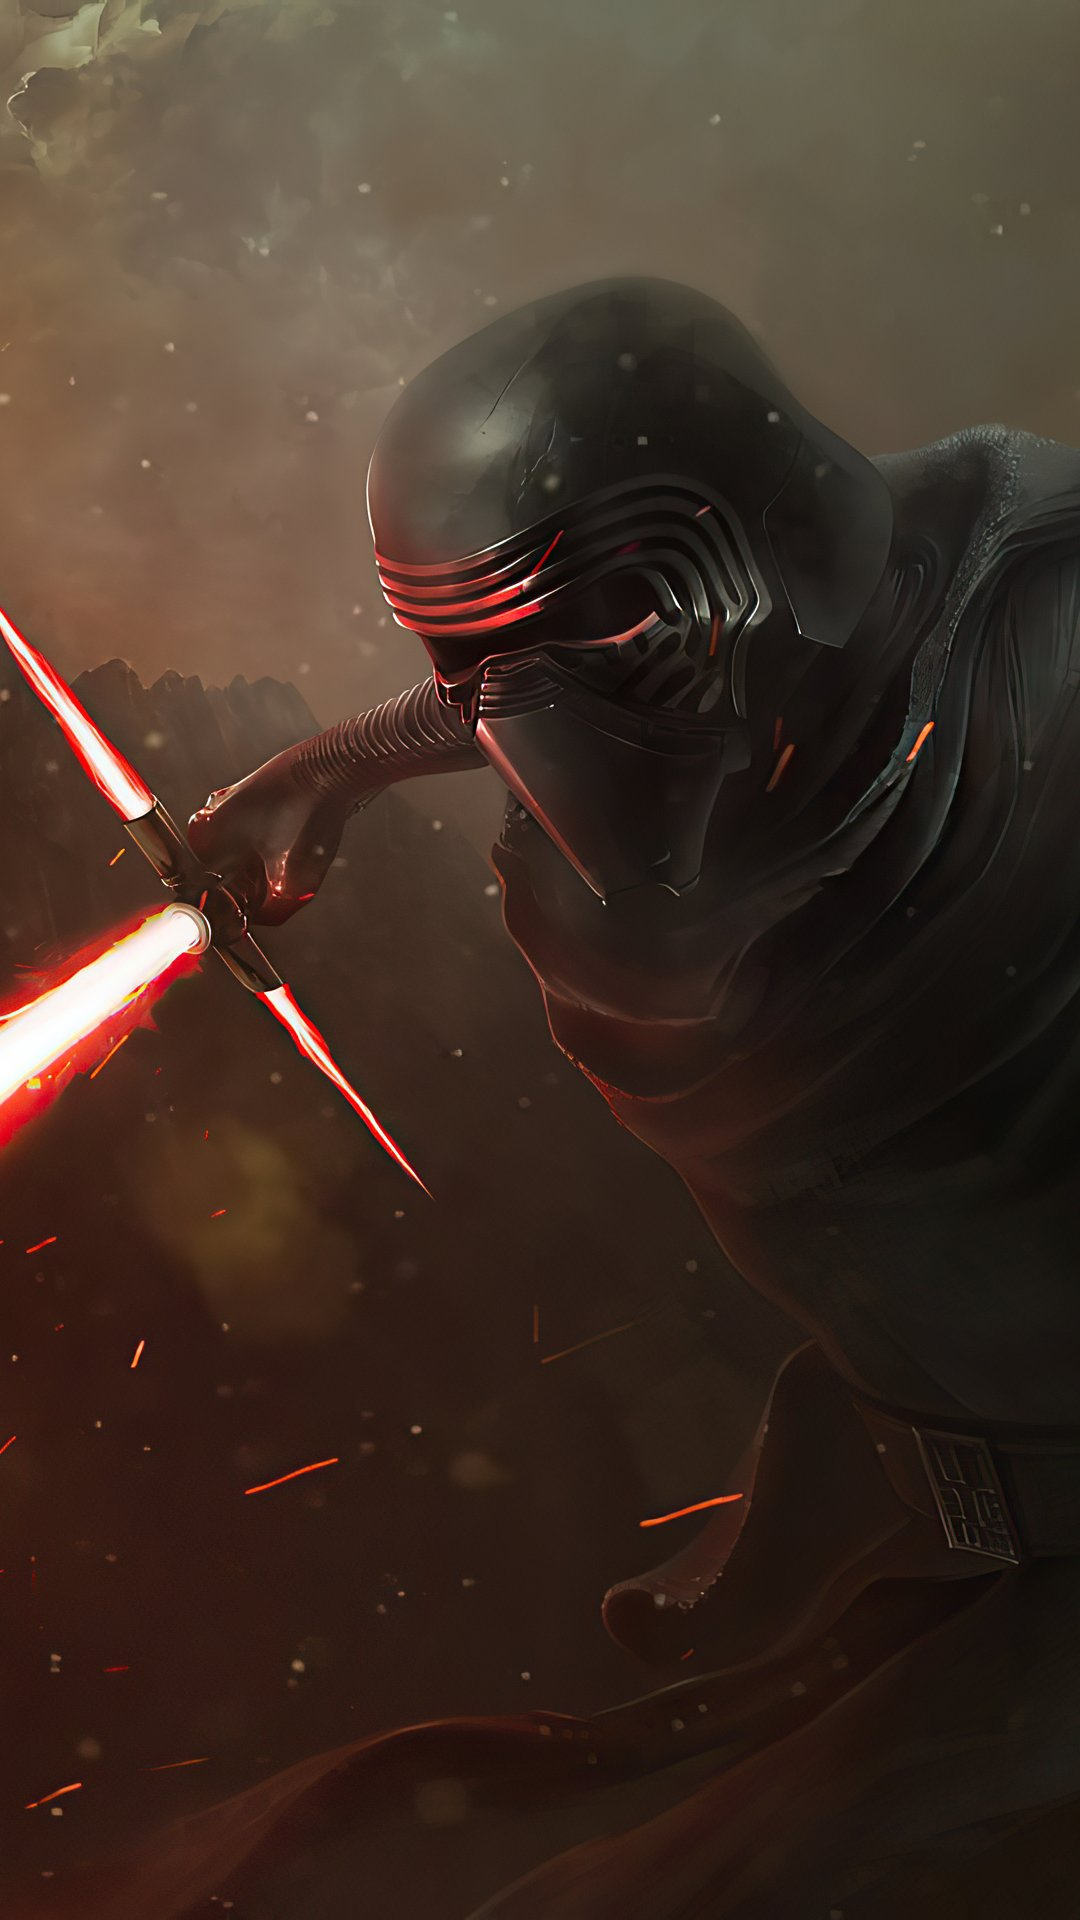 Fondos de pantalla Kylo Ren de Star Wars 2020 Vertical